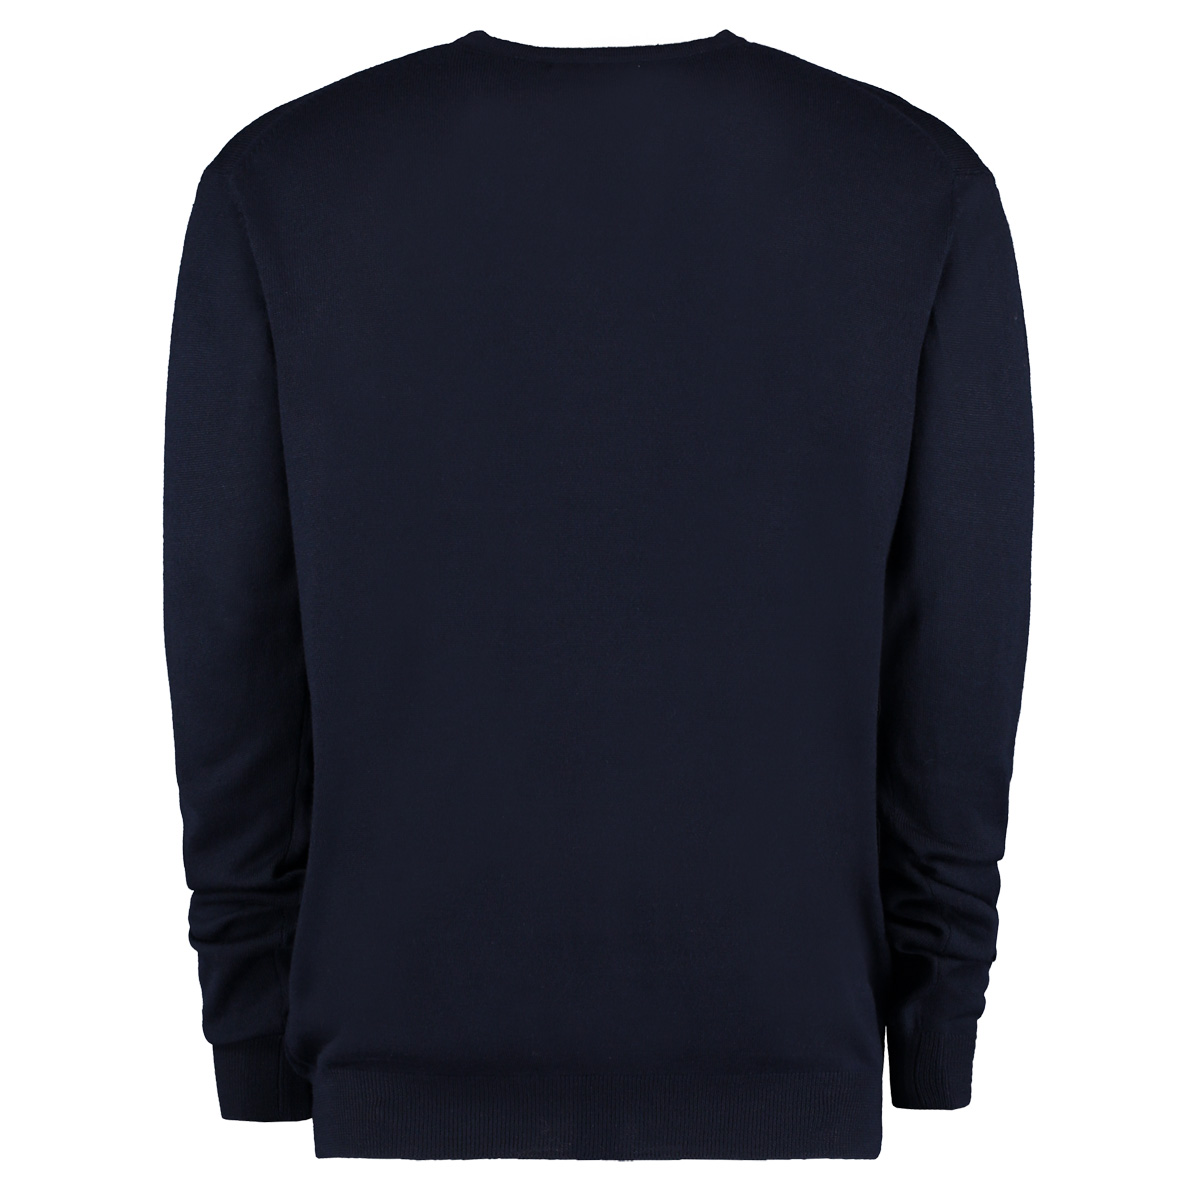 Long Sleeved V Neck Pullover